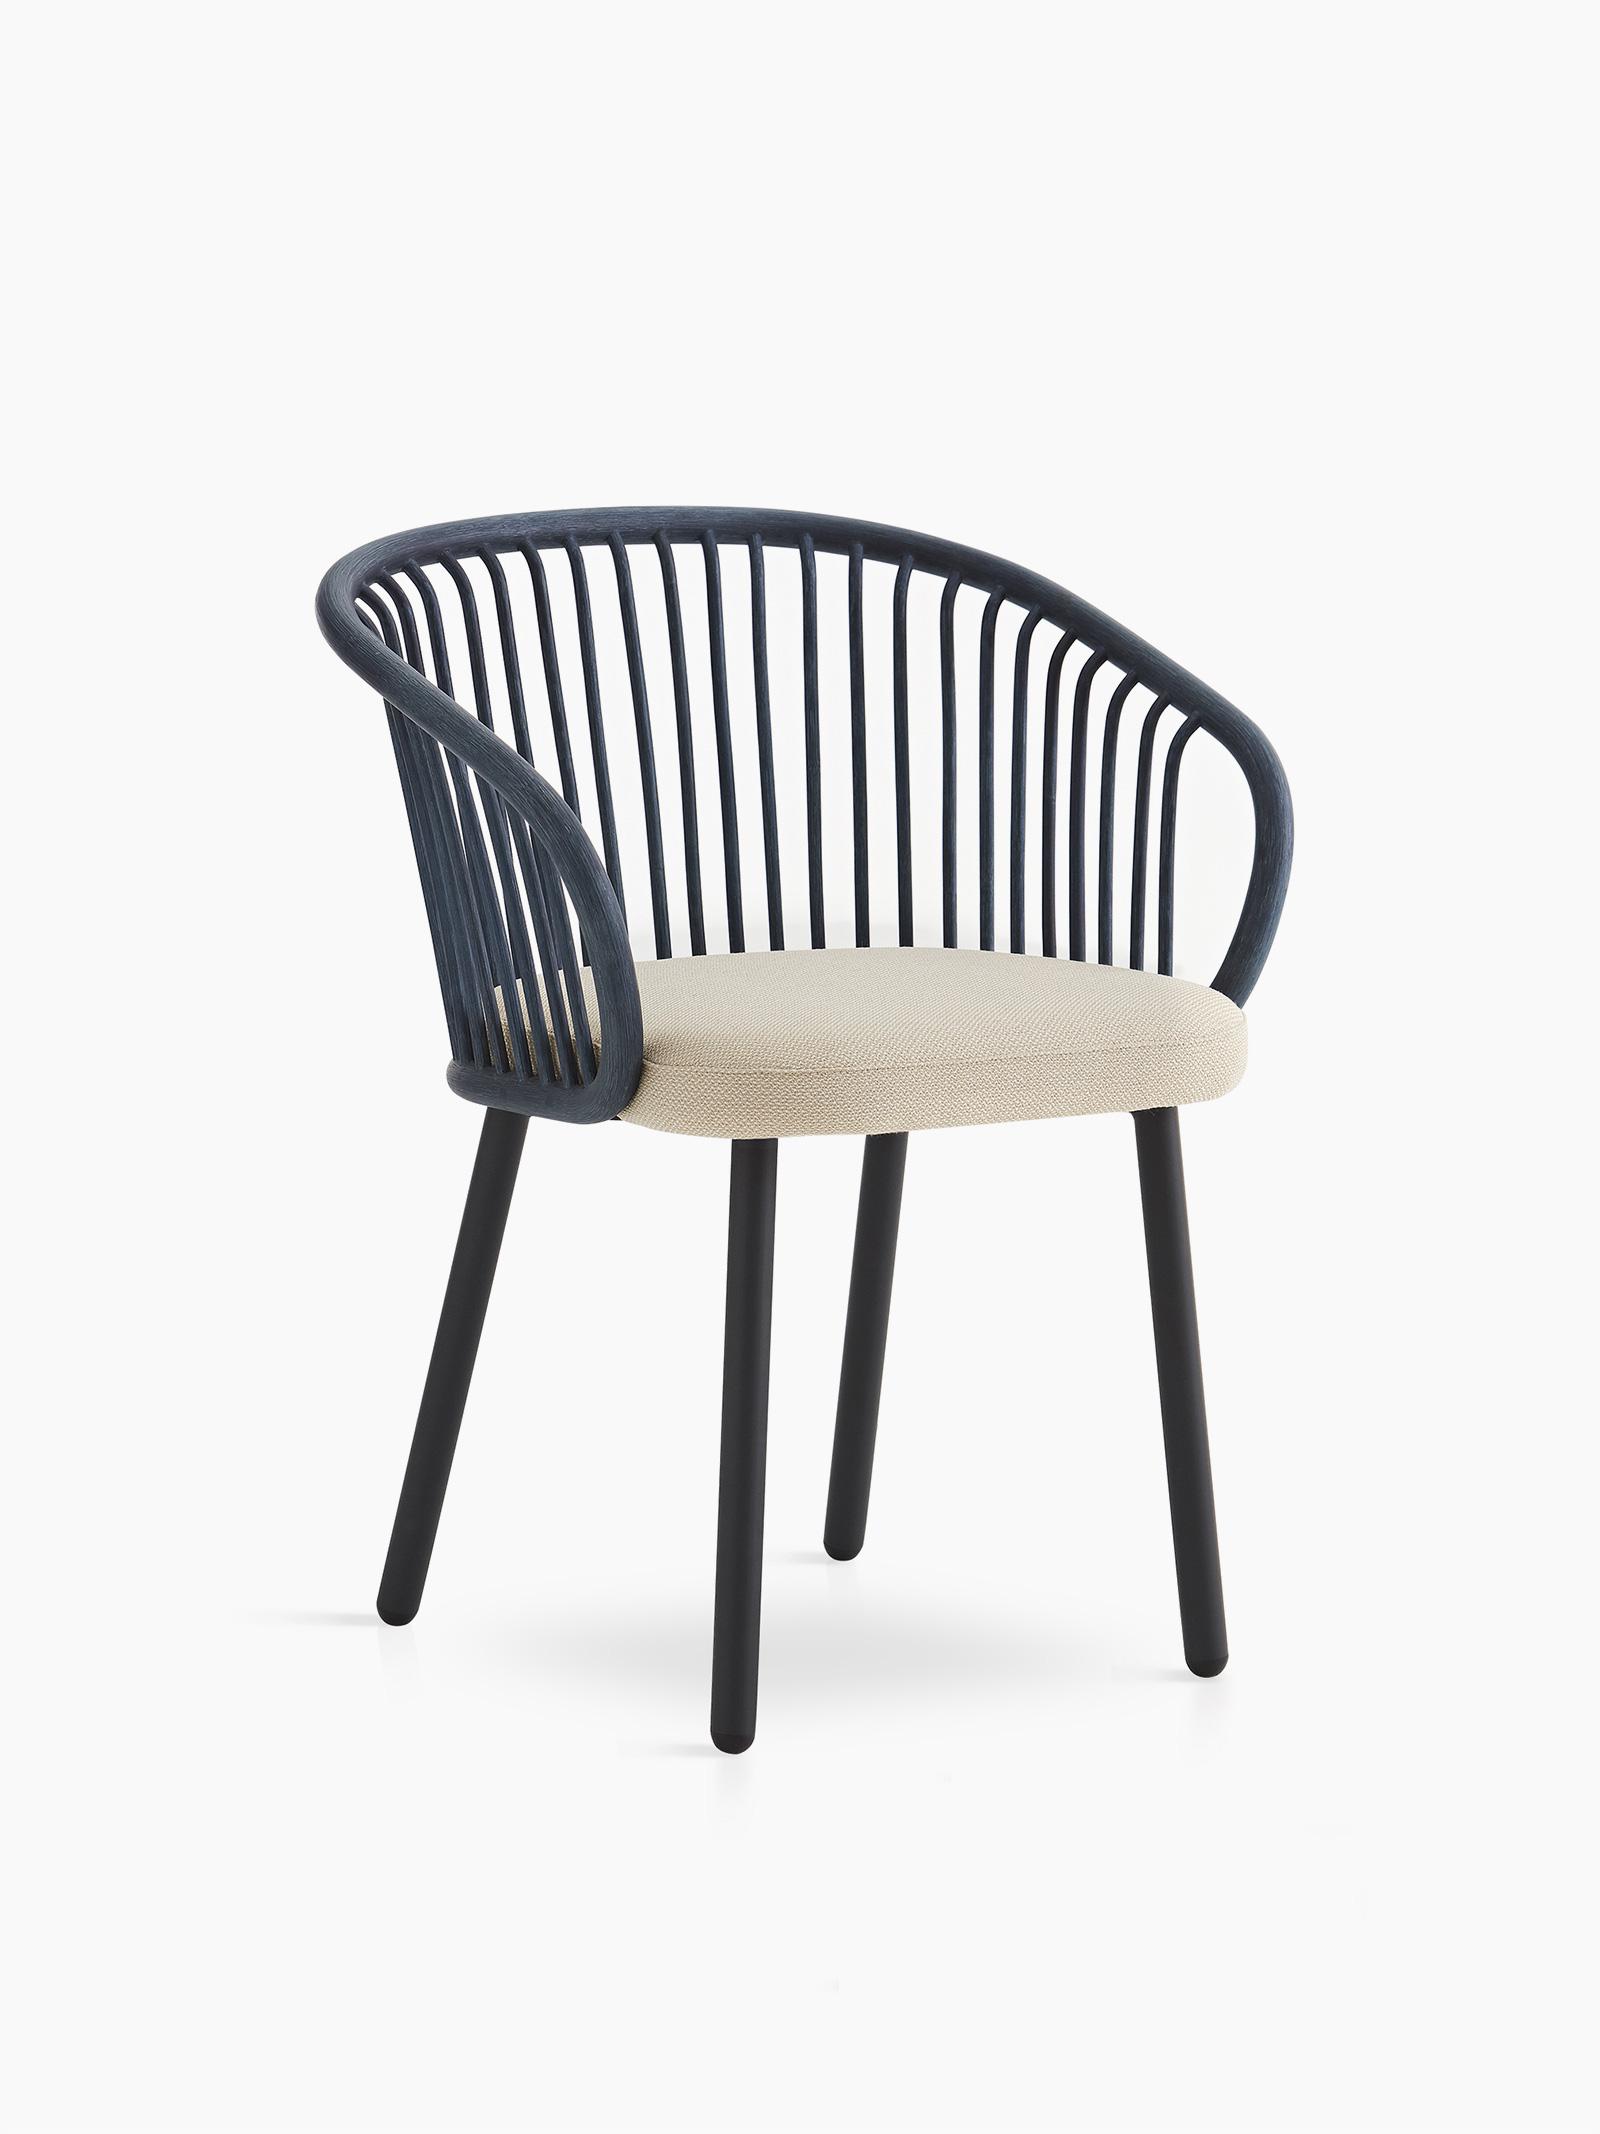 TinnappleMetz-Expormim-huma-armchair-01